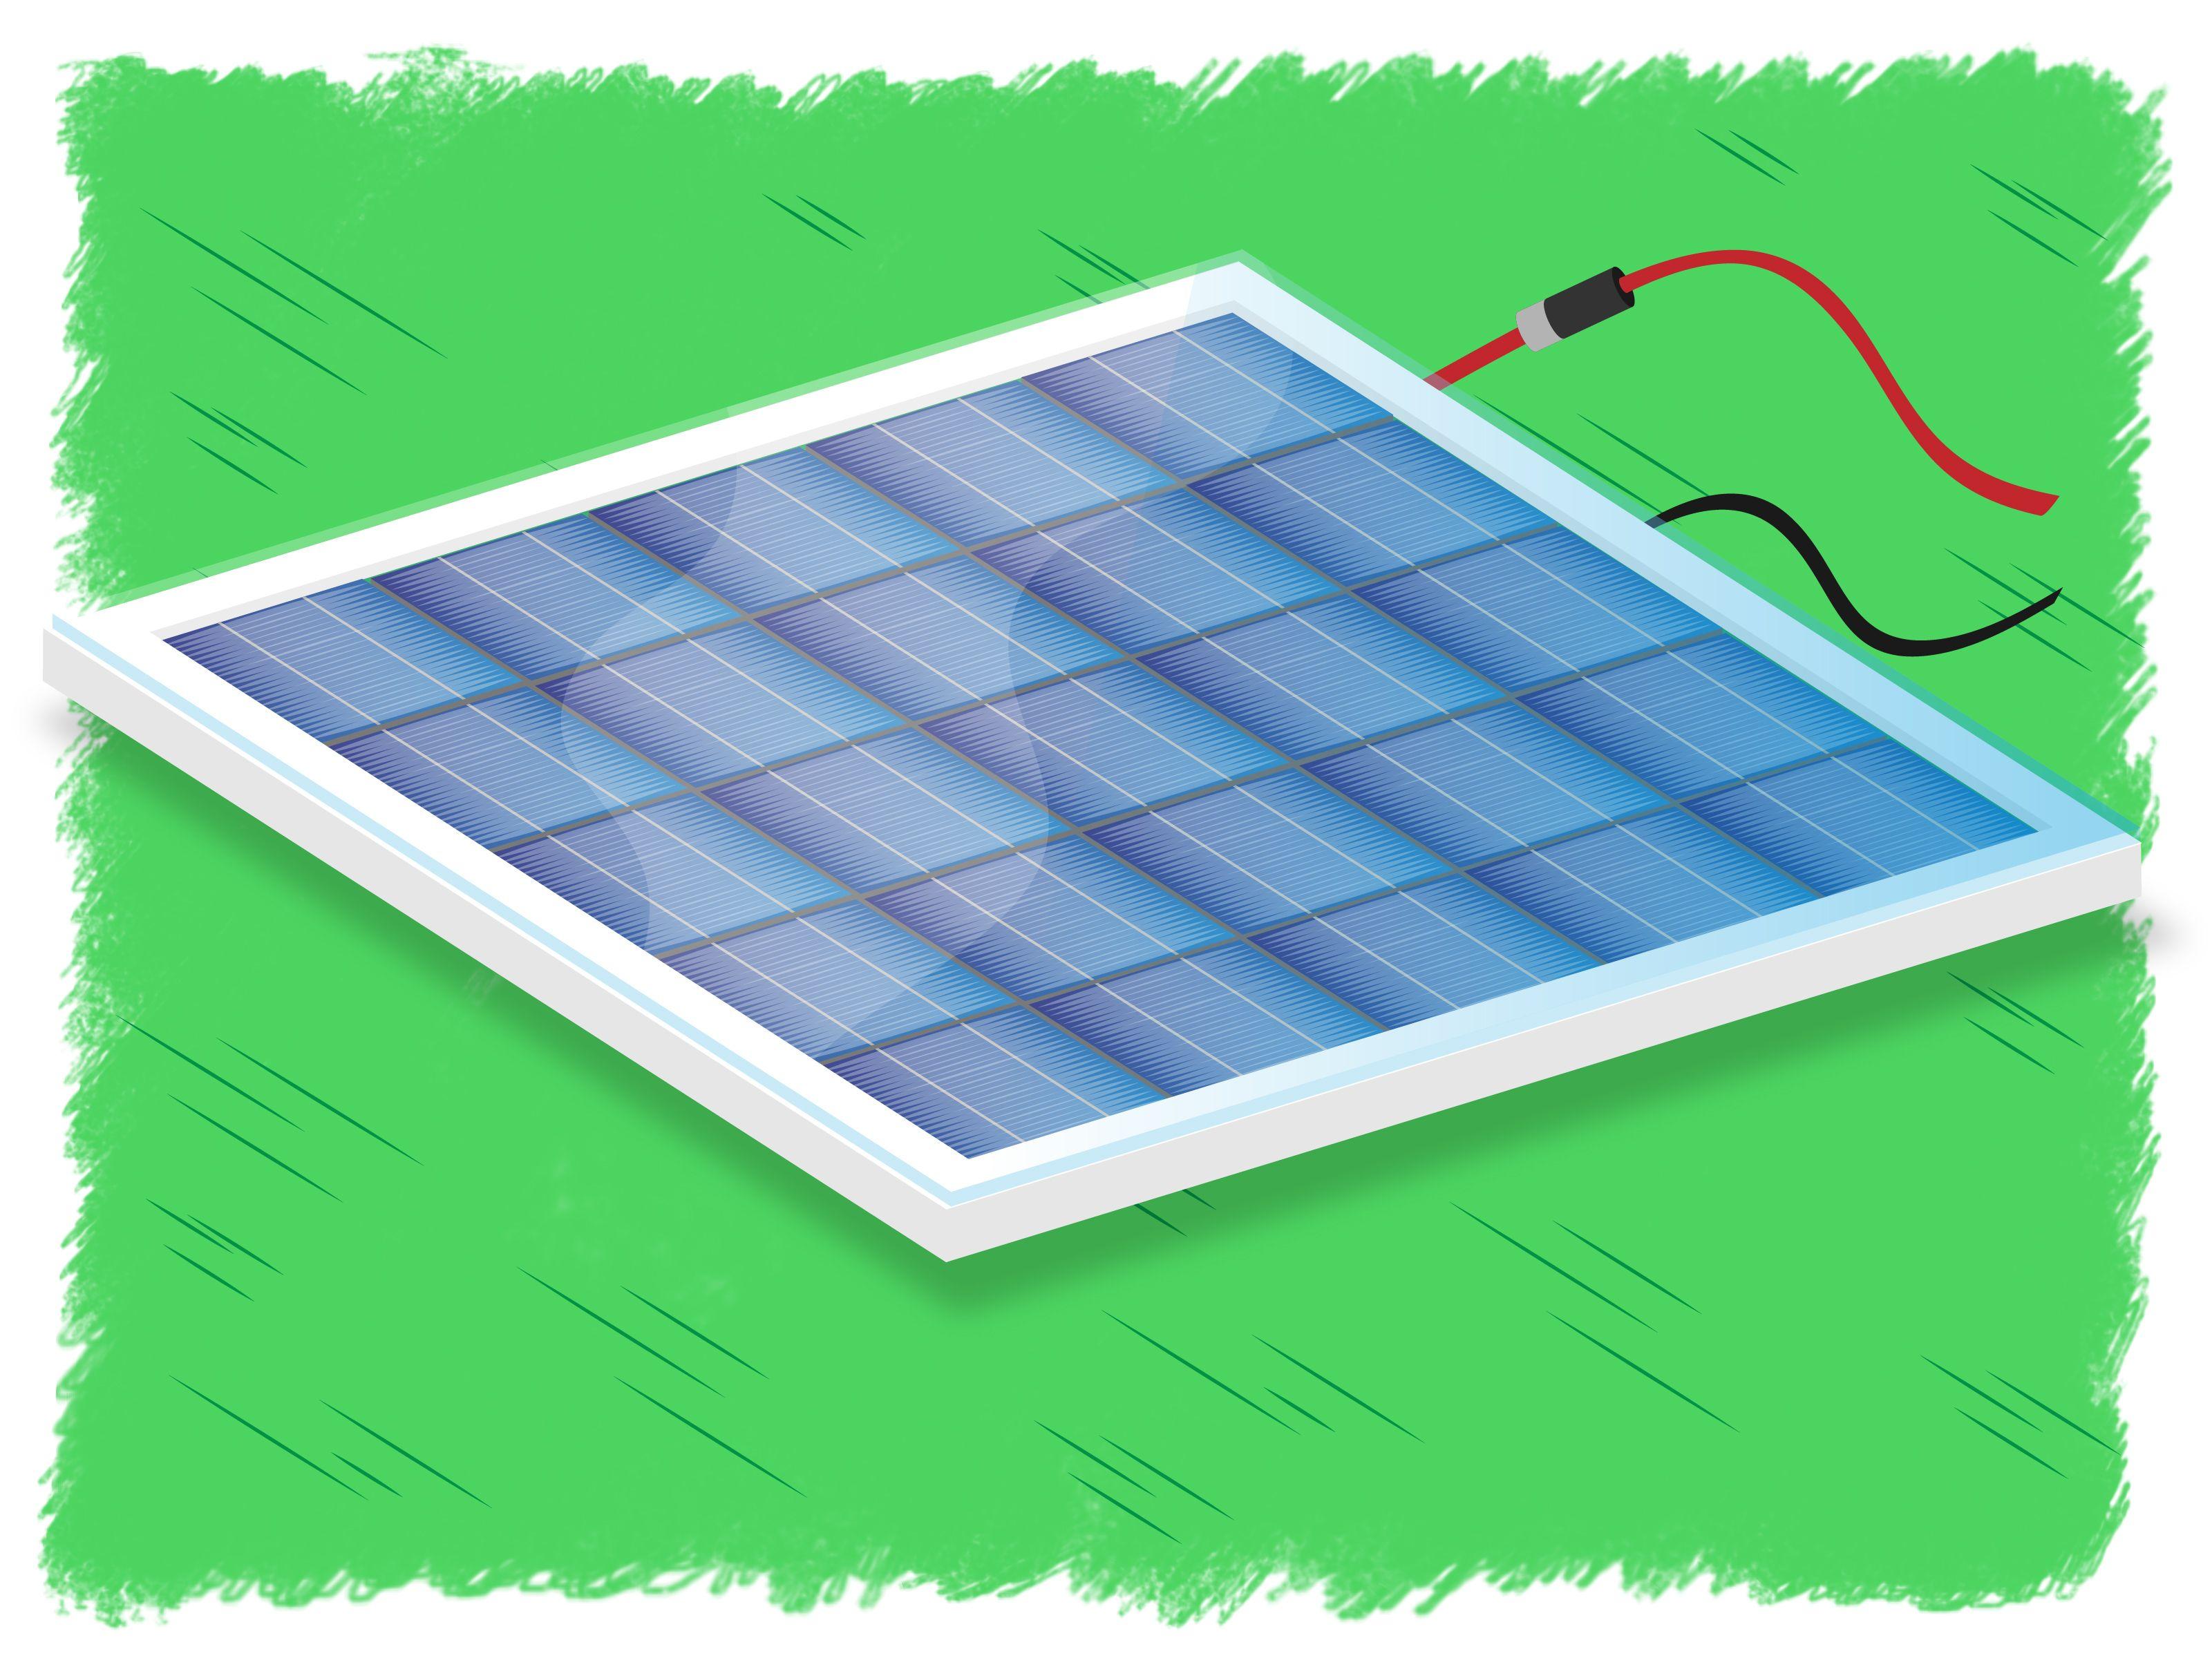 Build a solar panel solar energy projects solar panels